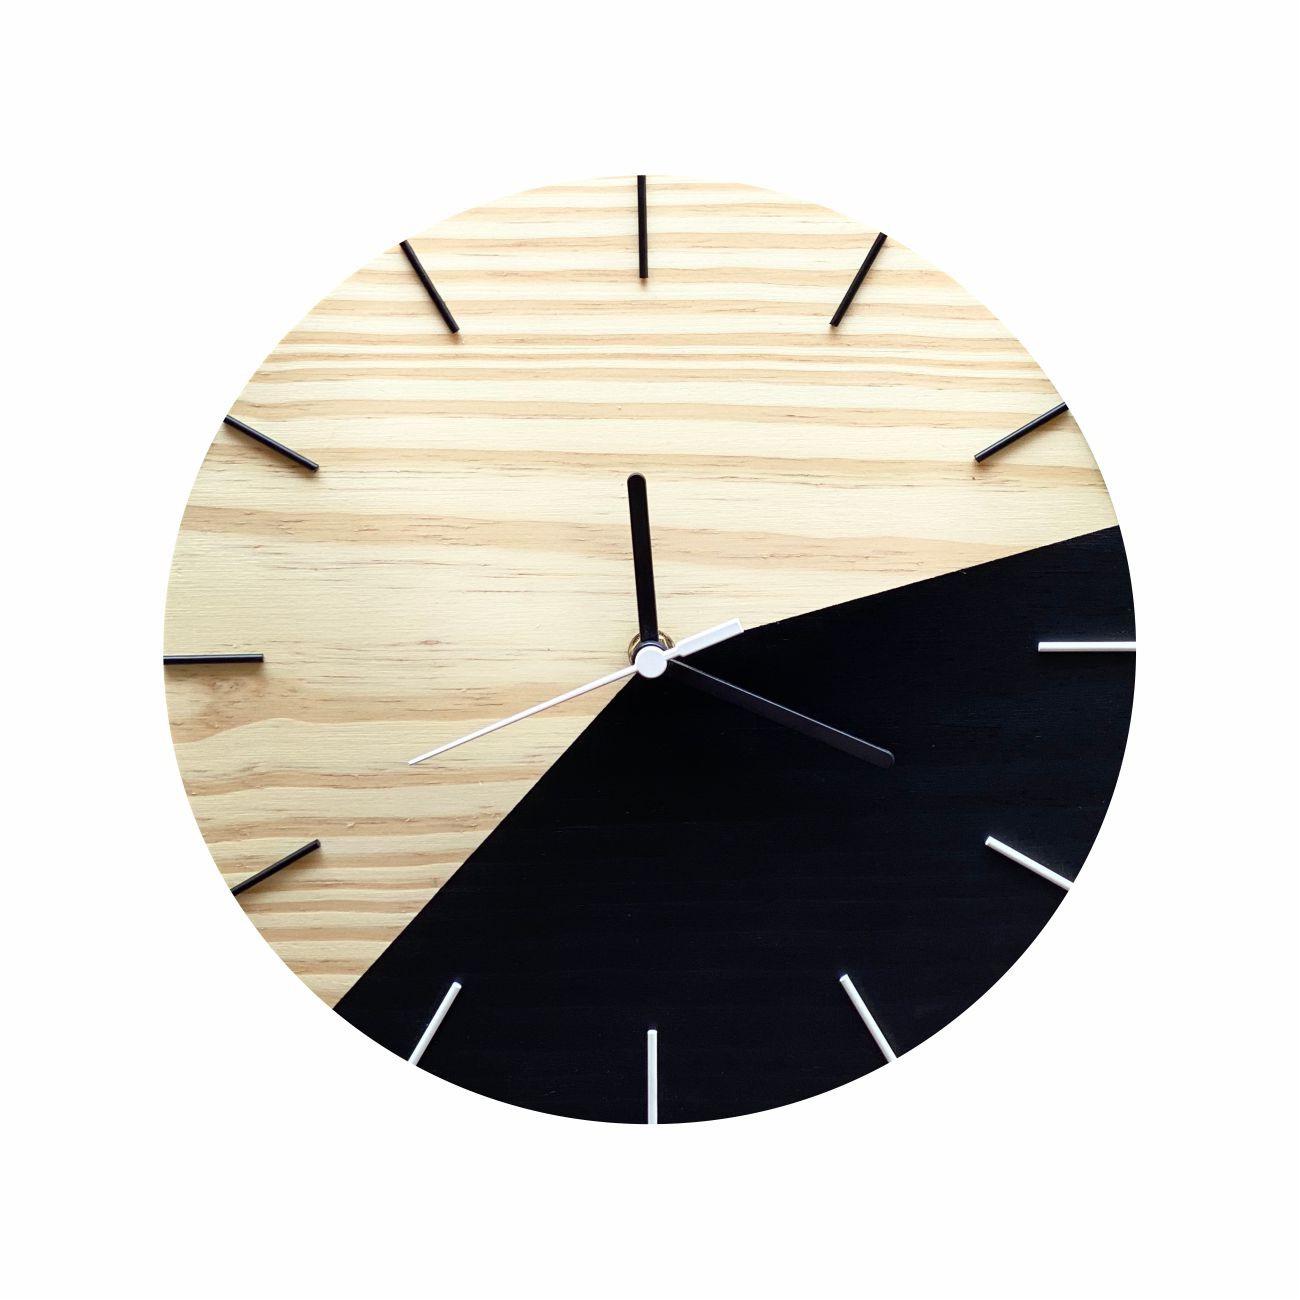 Relógio de Parede Minimalista Preto e Branco 28cm